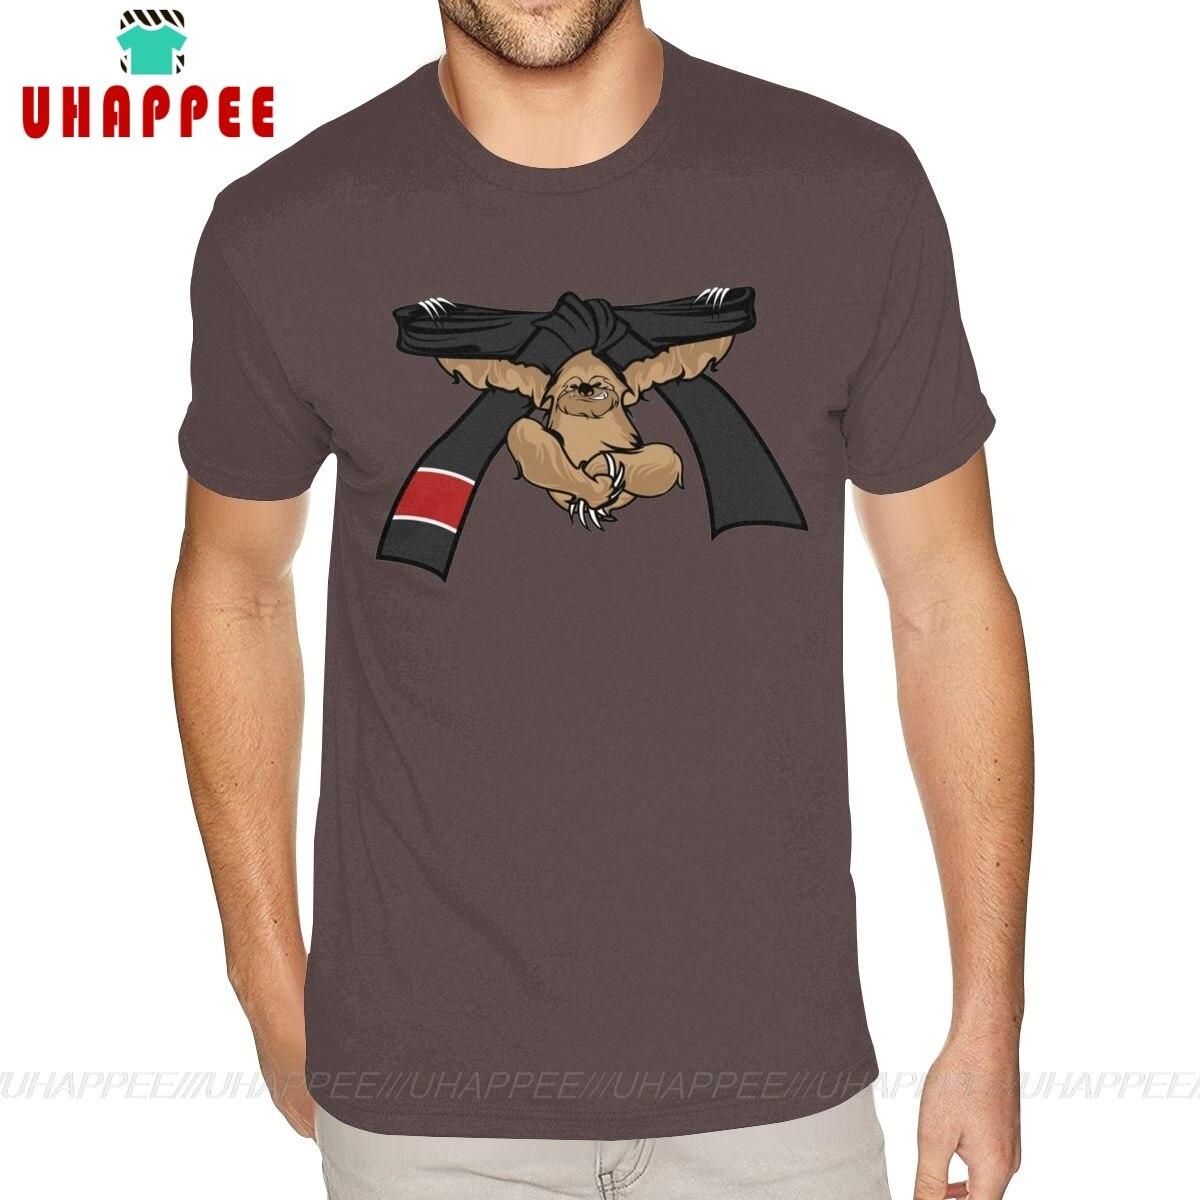 Camiseta de manga corta, cuello redondo, 100%, de algodón, Sloth Jiu Jitsu, BJJ, cinturón negro, camisetas para hombre con estilo S